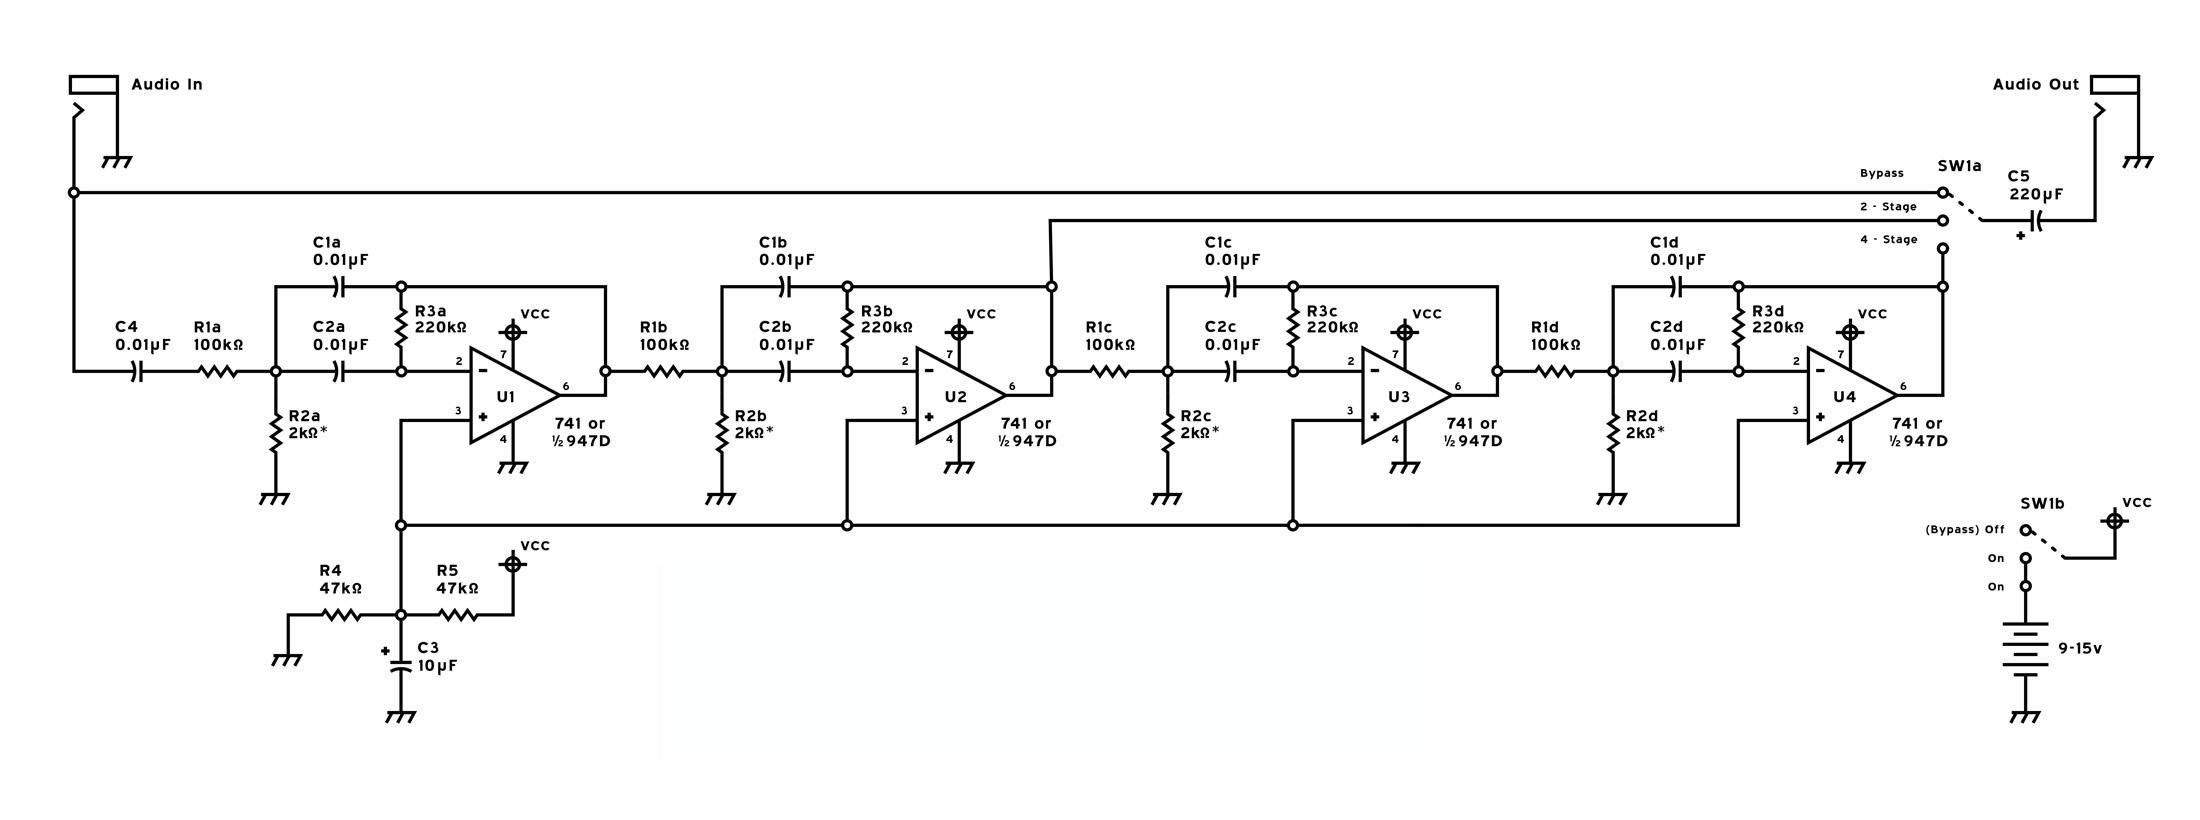 Cb Radio Mixer Wiring Auto Electrical Diagram